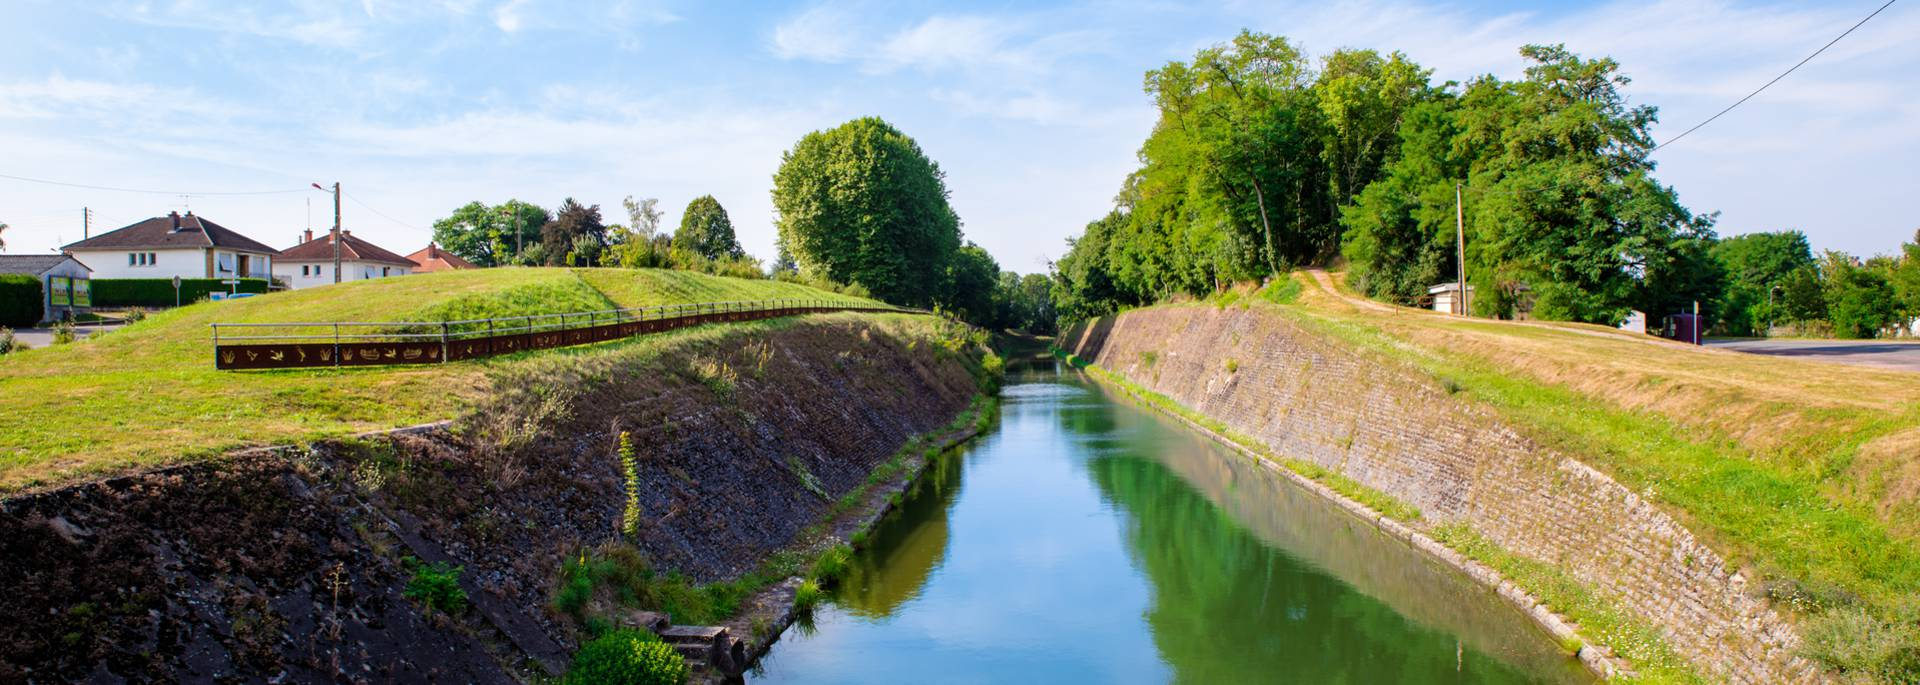 La tranchée du canal, Génelard. © Franck Juillot.